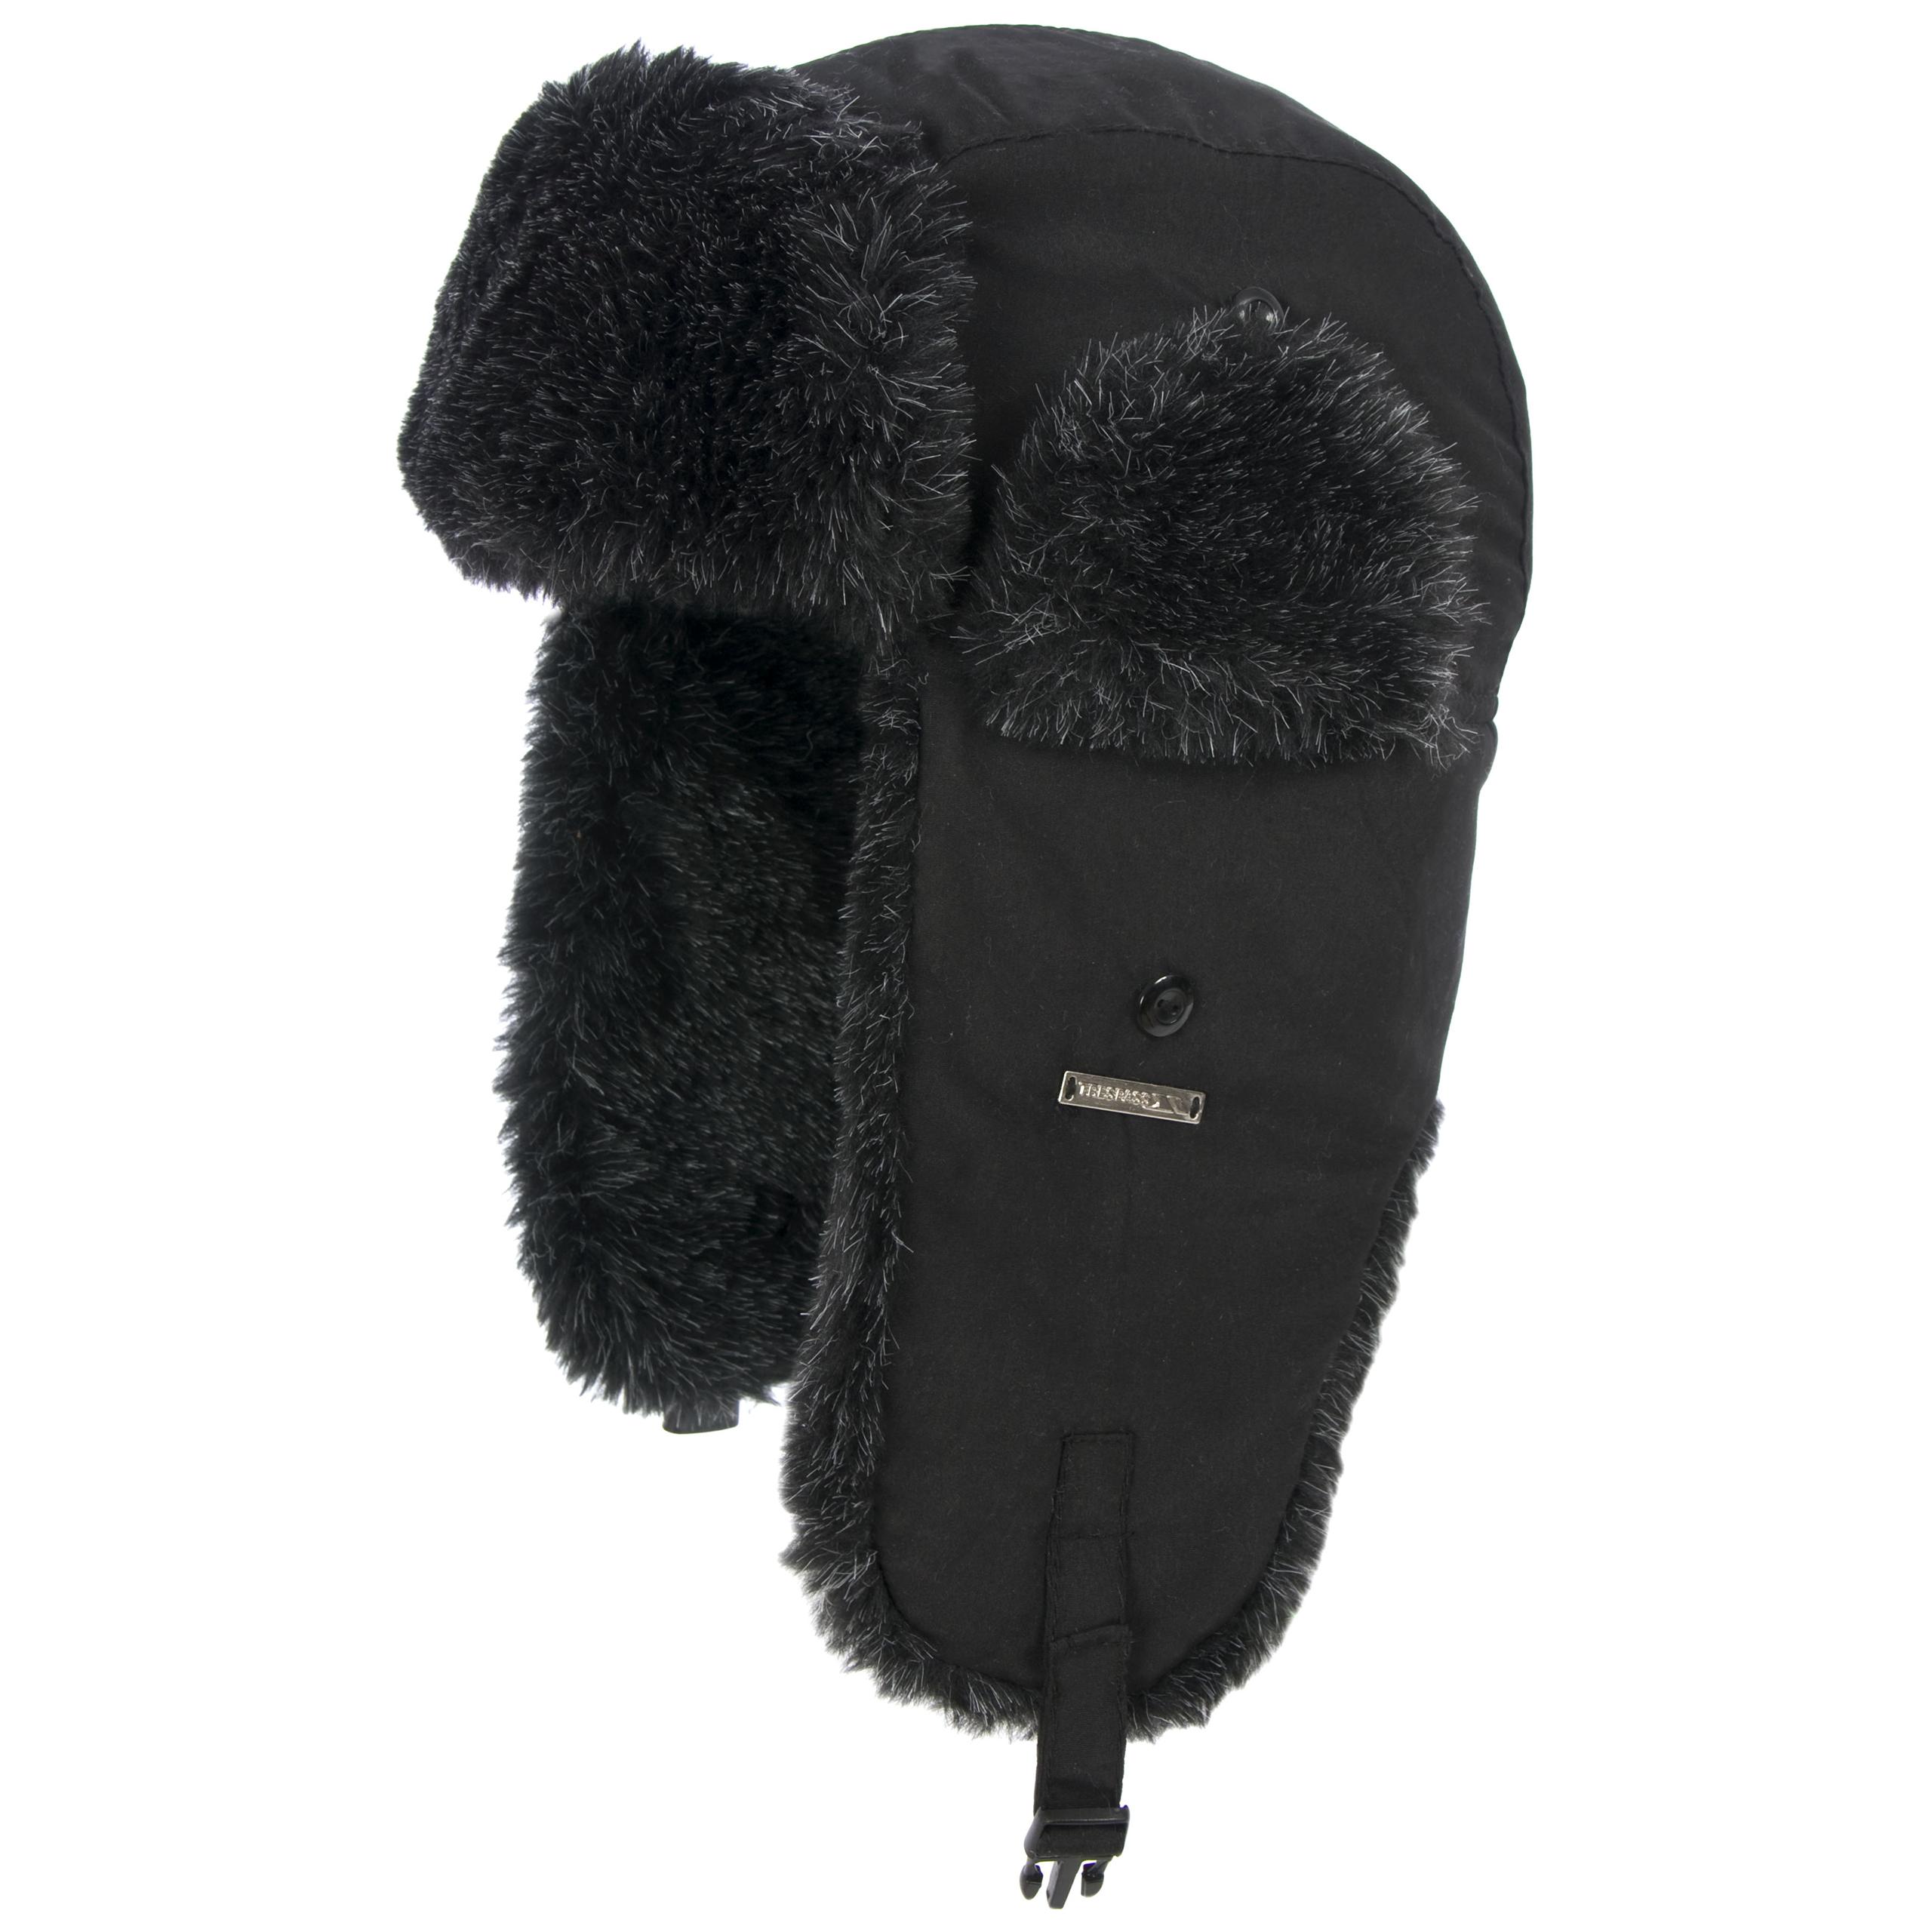 ae40e8ad9cf7df Sherwood men's trapper hat | Trespass UK